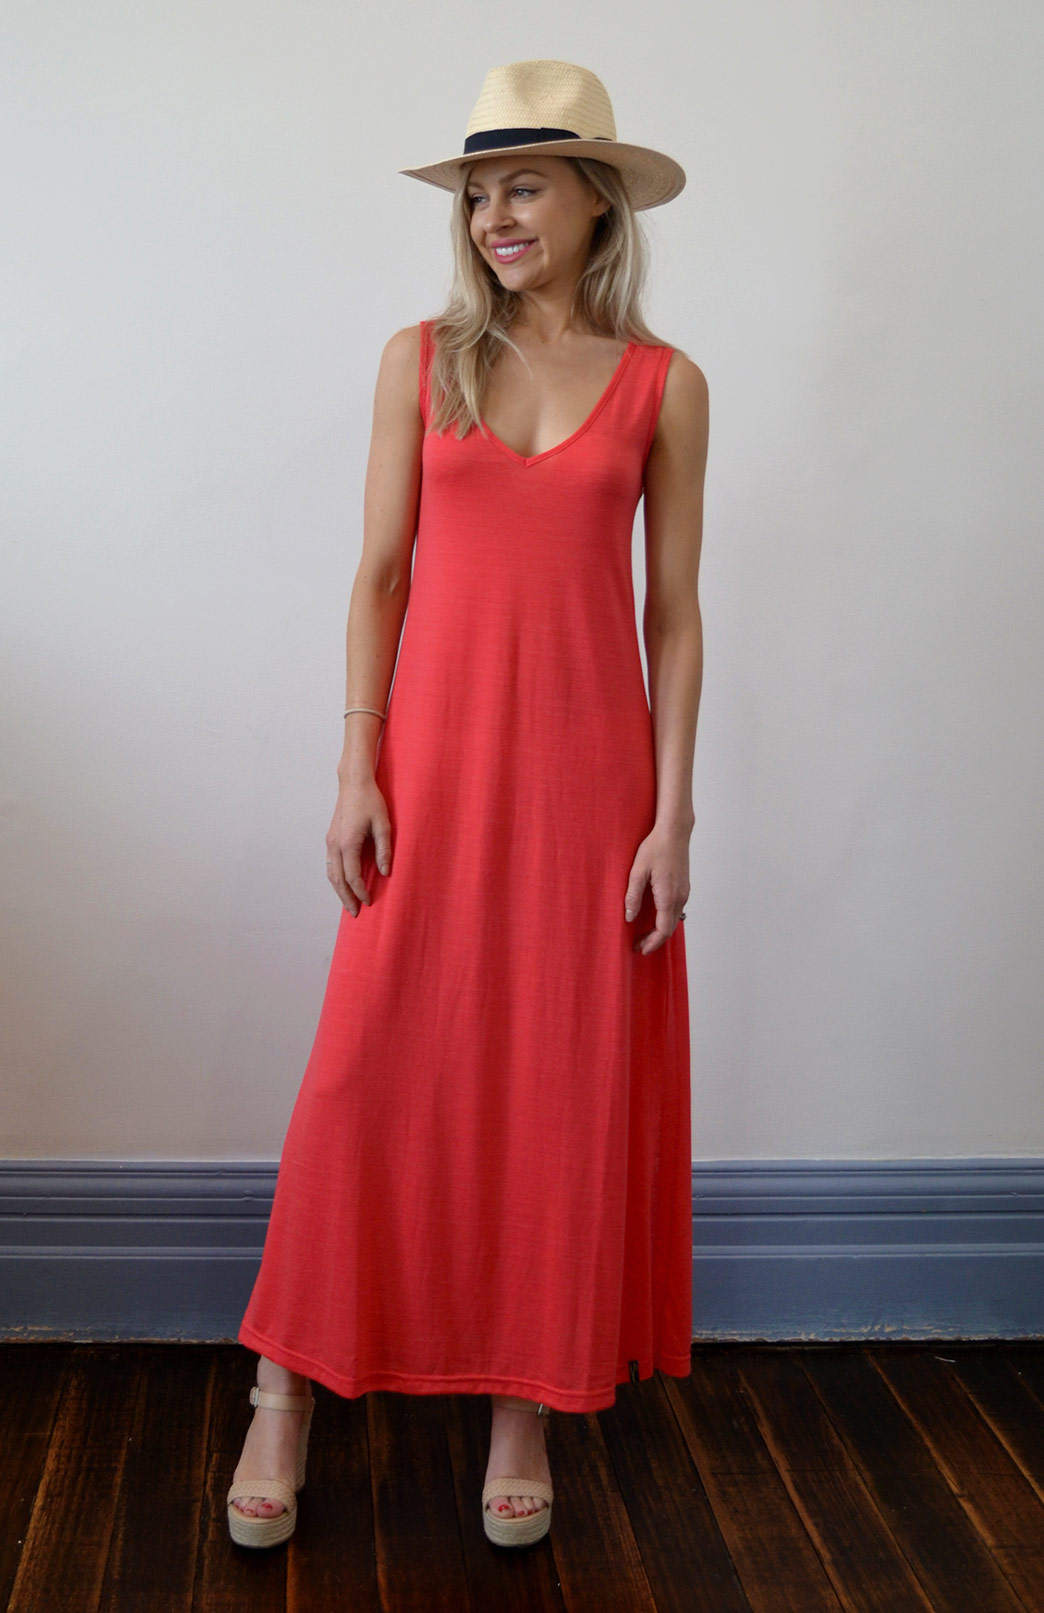 V-Neck Maxi Dress - Women's Hot Coral Merino Wool & Modal Blend V-Neck Sleeveless Maxi Dress with side split - Smitten Merino Tasmania Australia